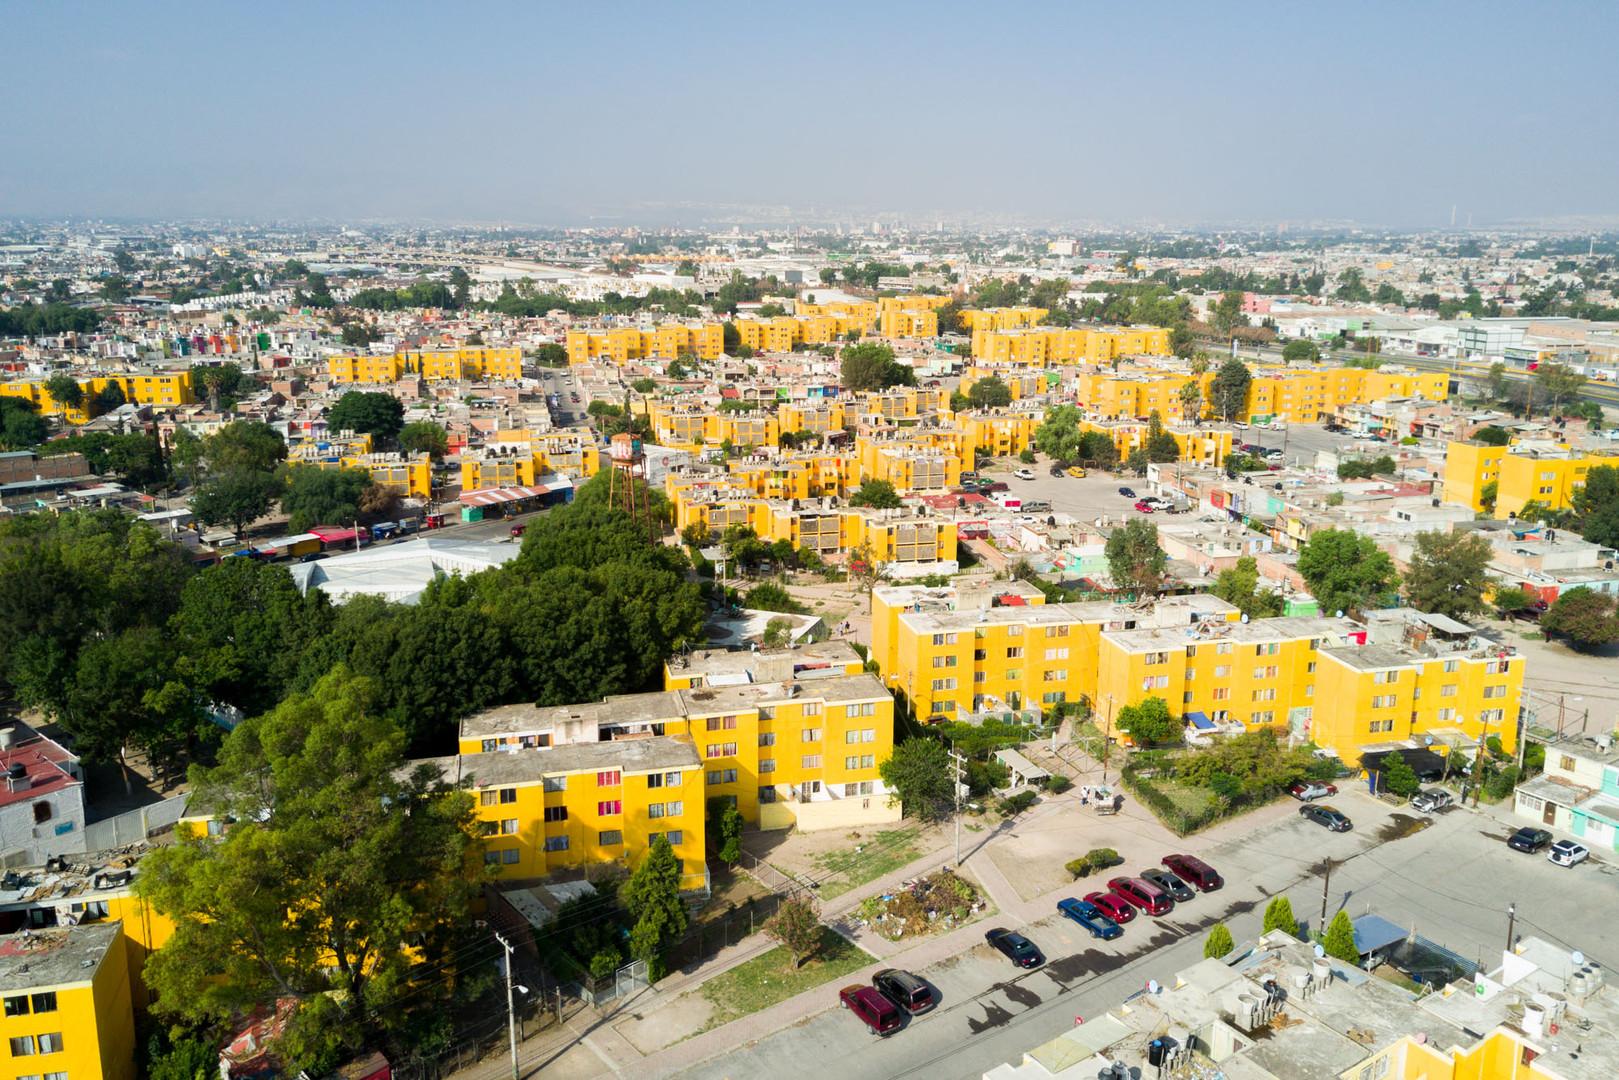 JFF_Hecho-en-Barrio-2.jpg